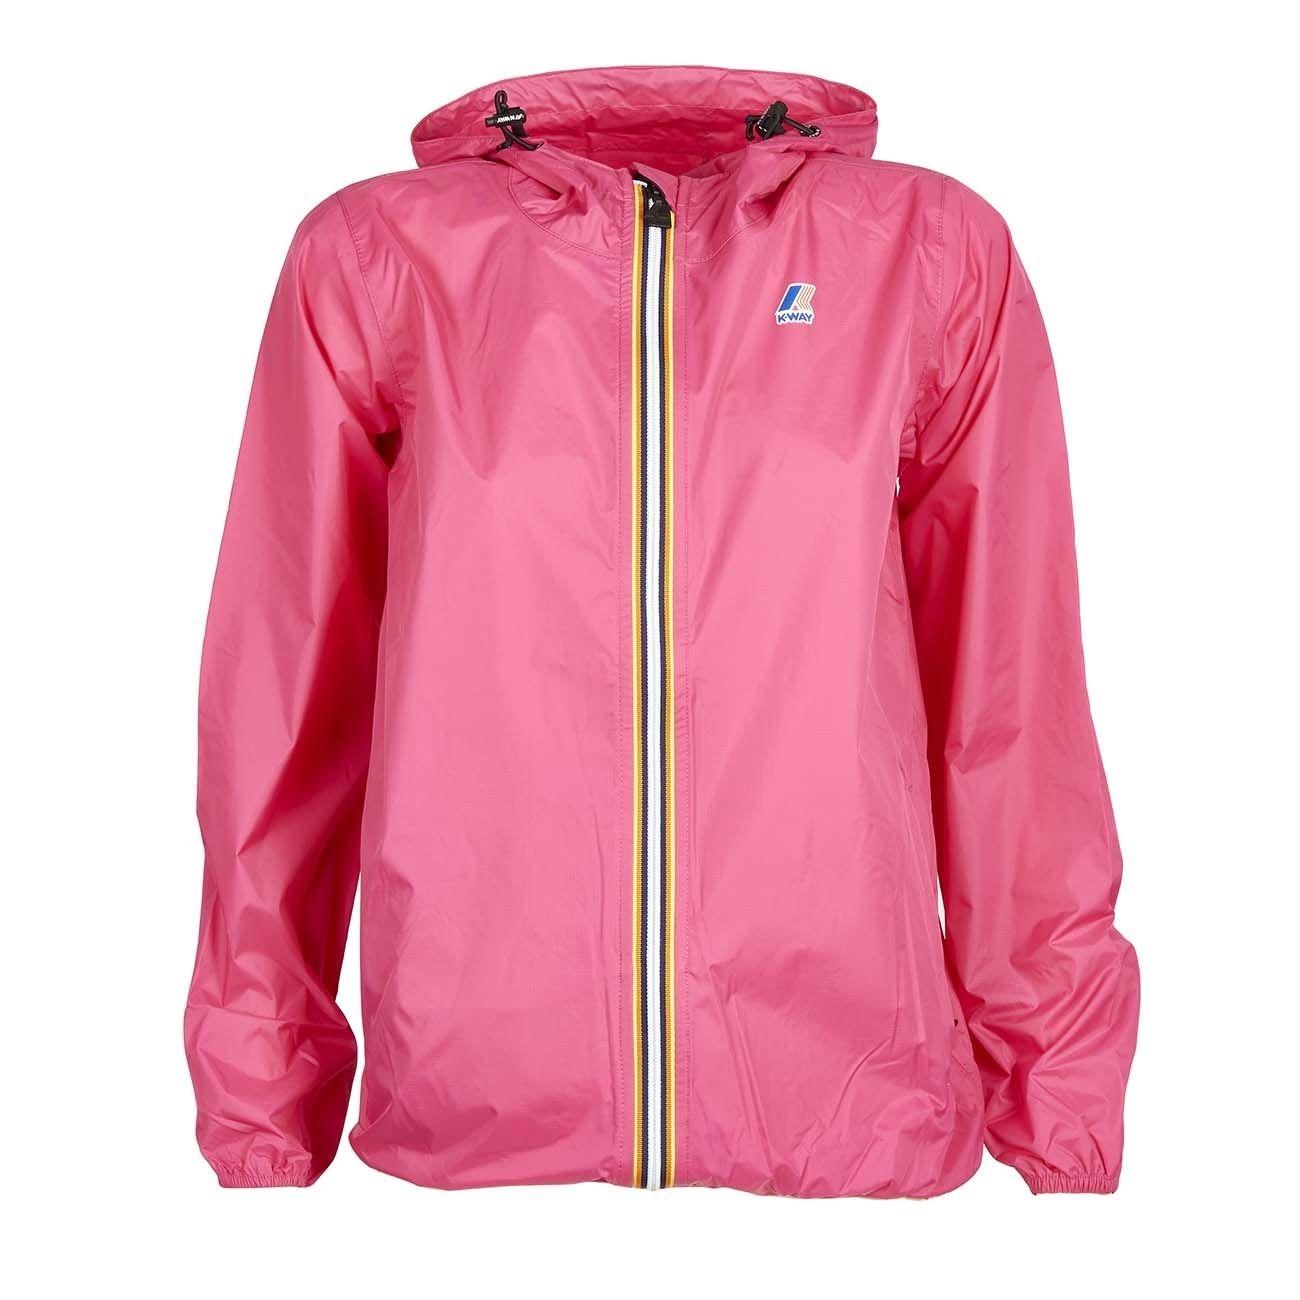 K-Way Womens Claudette Jacket